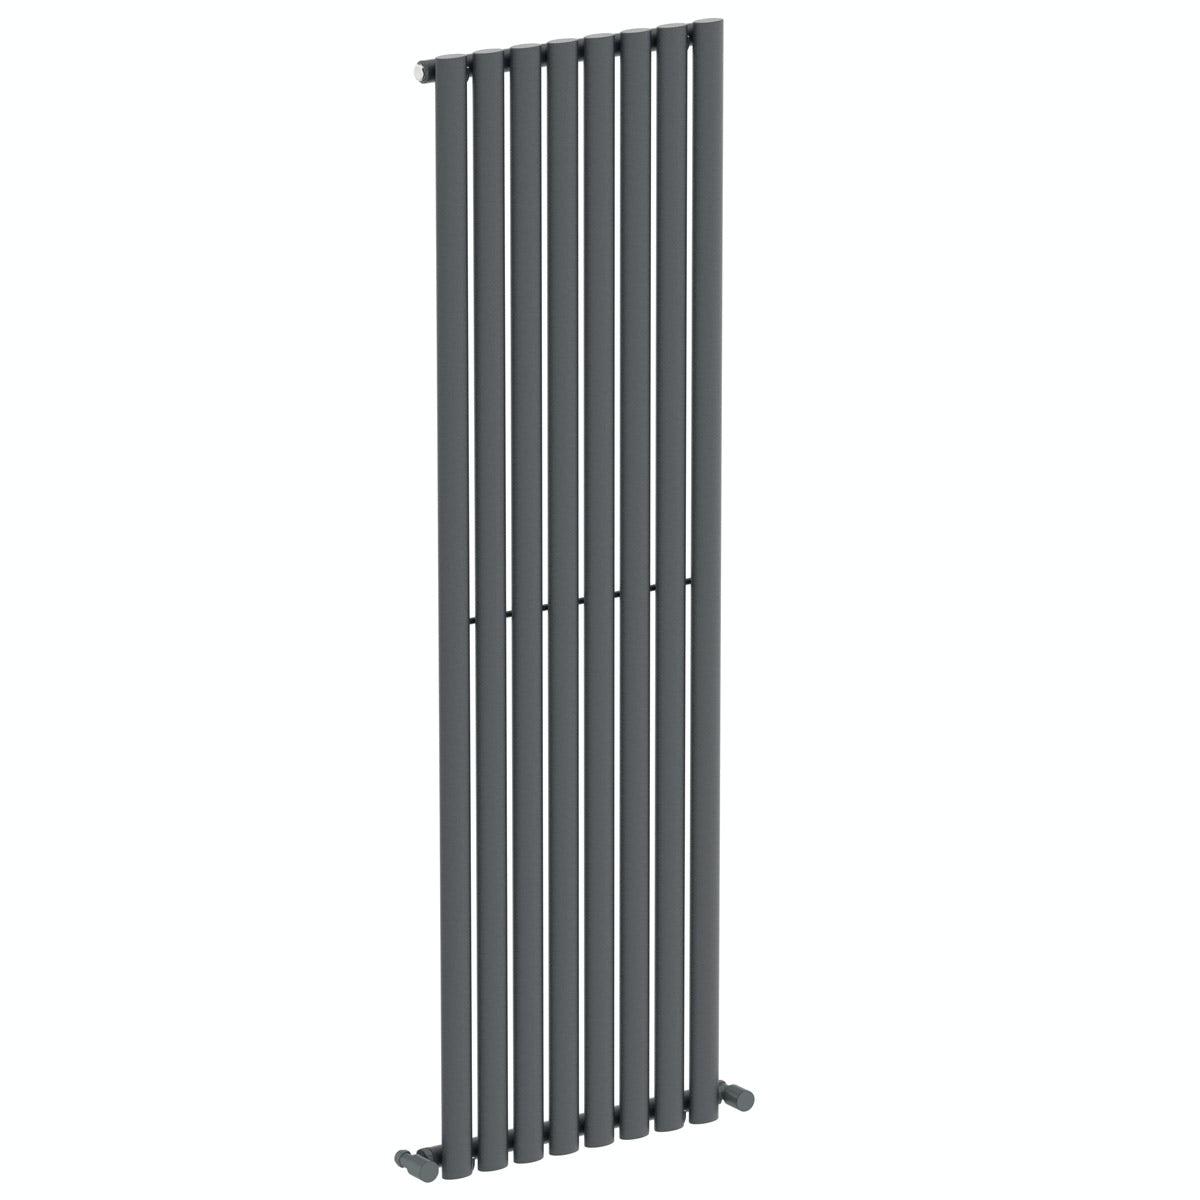 Mode Tate single vertical radiator 1600 x 480